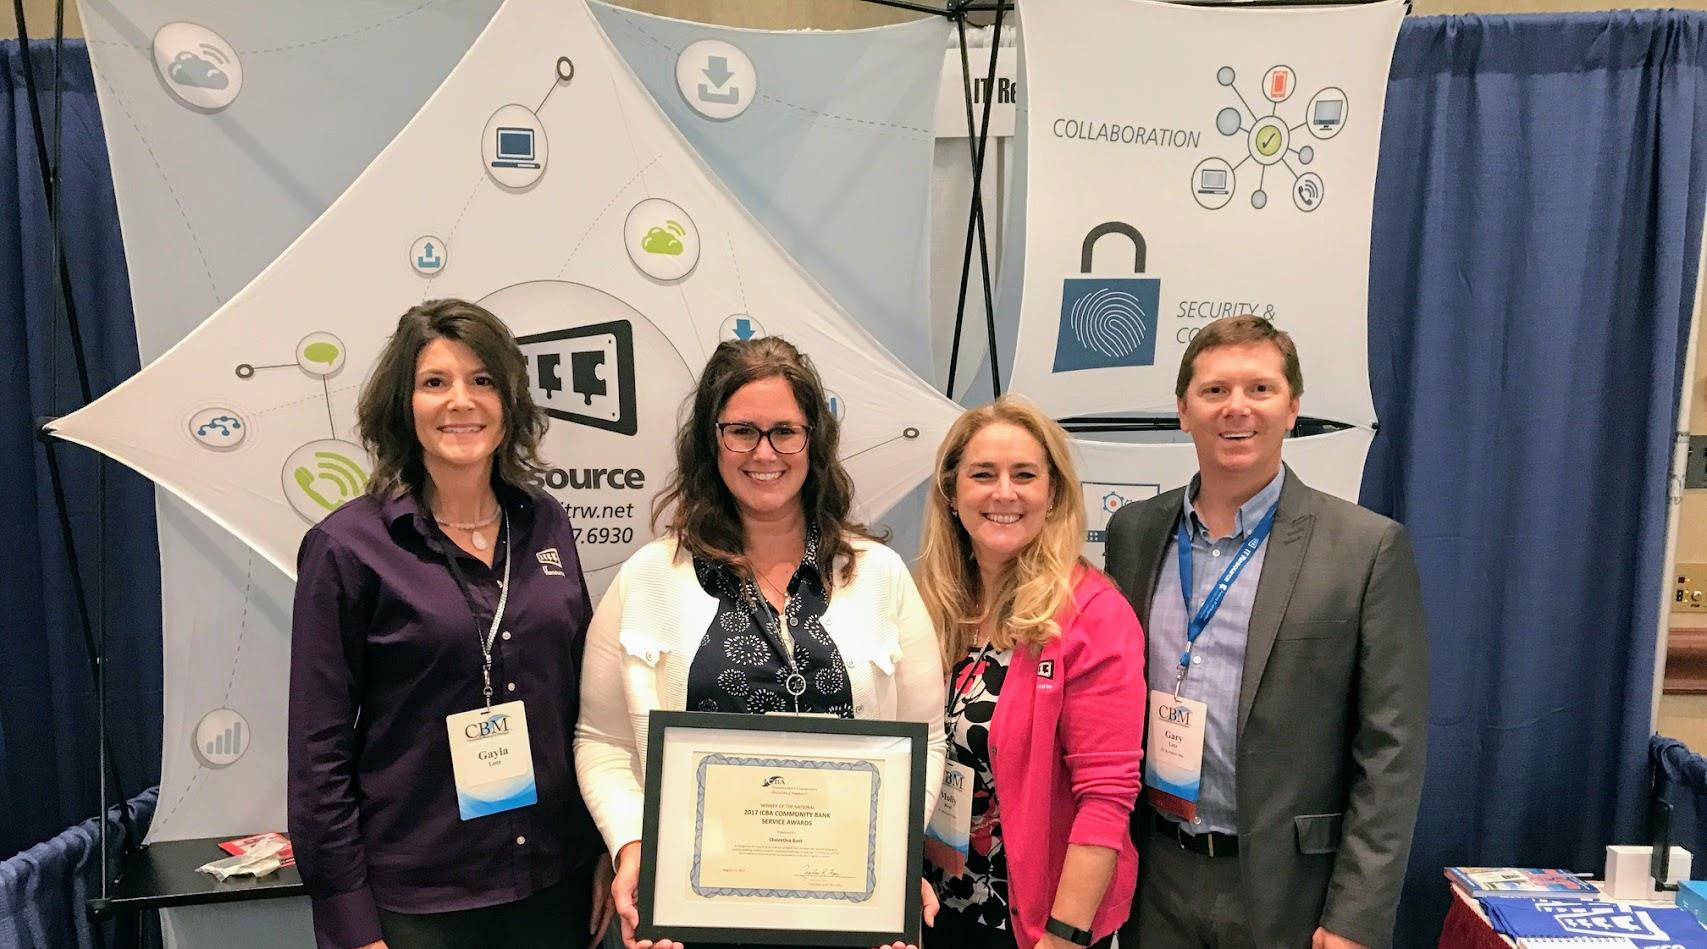 IT Resource - ChoiceOne Bank Award Photo - 03-01-2018